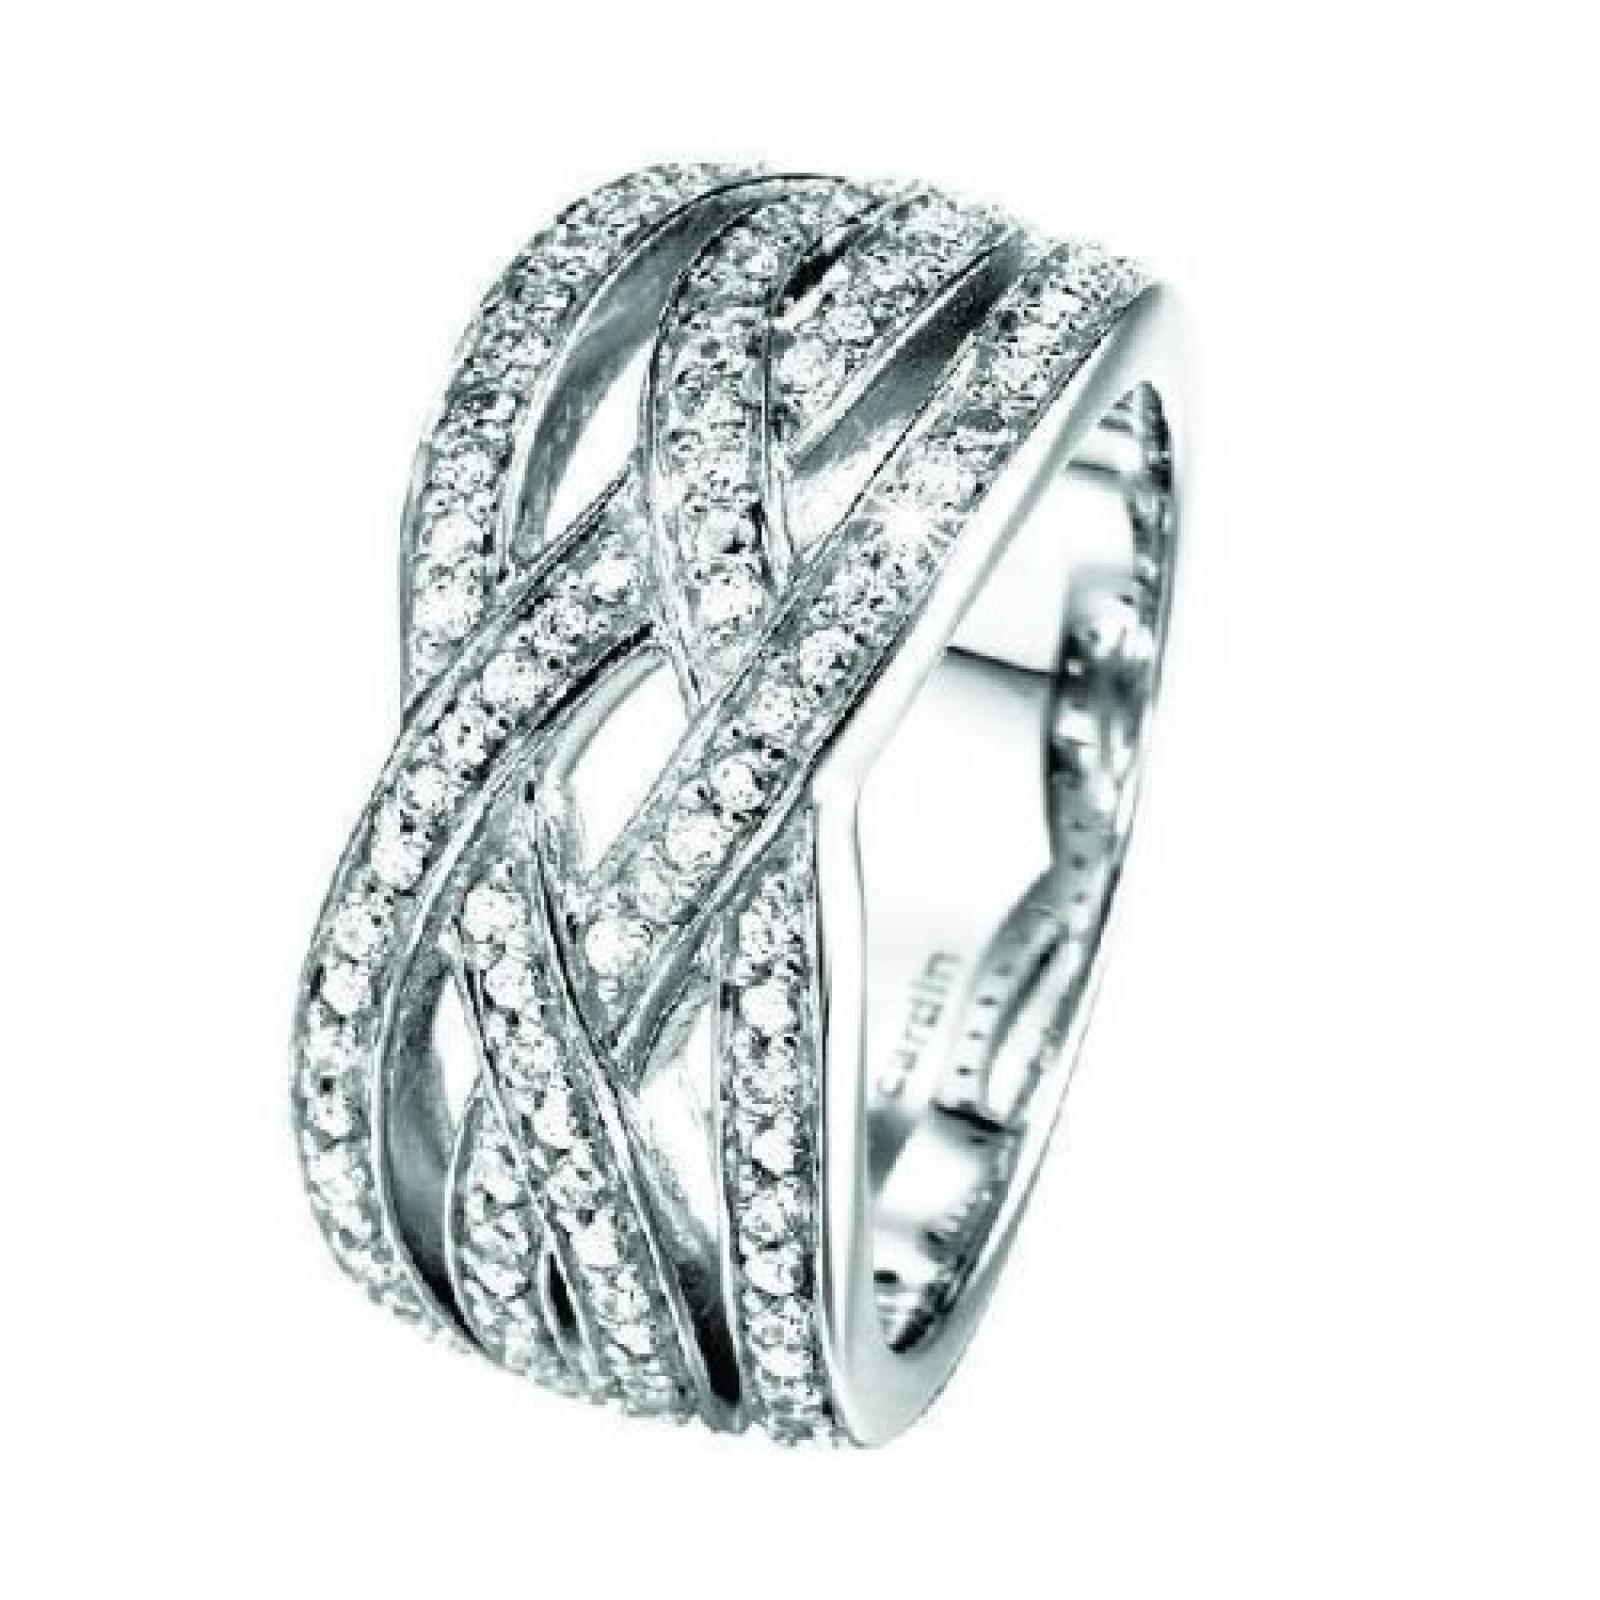 Pierre Cardin Damen-Ring Enlace Sterling-Silber 925 PCRG90246A